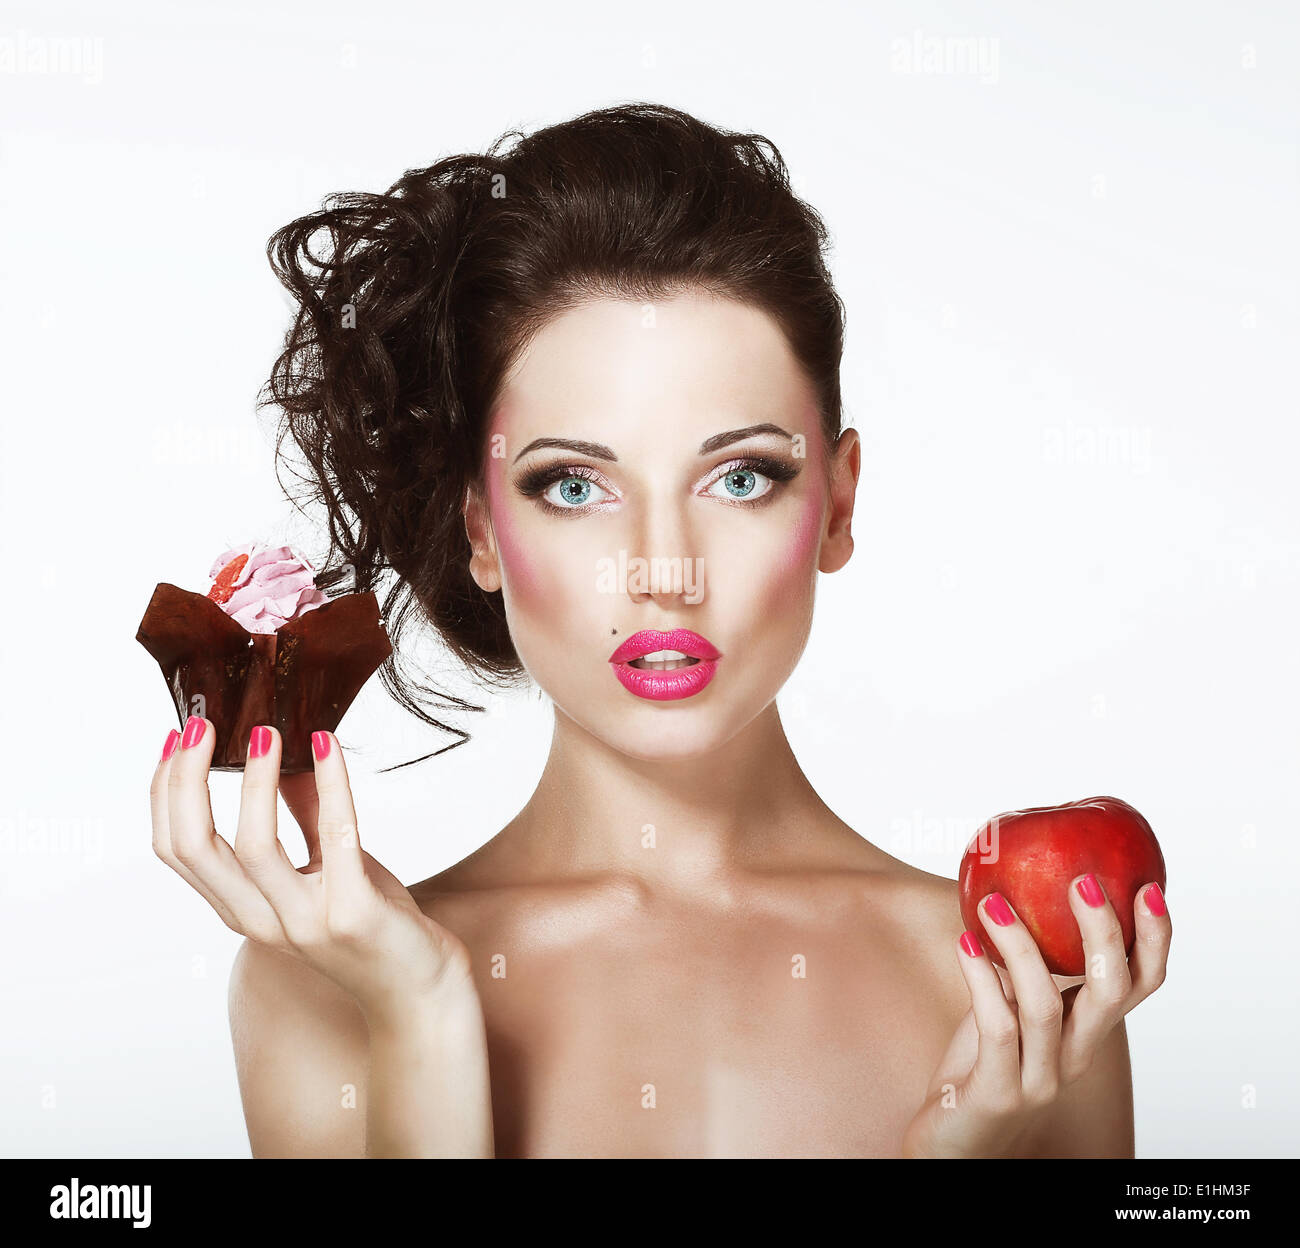 Dilemma. Ernährung. Unentschlossen Frau mit Apfel und Cupcake Stockbild